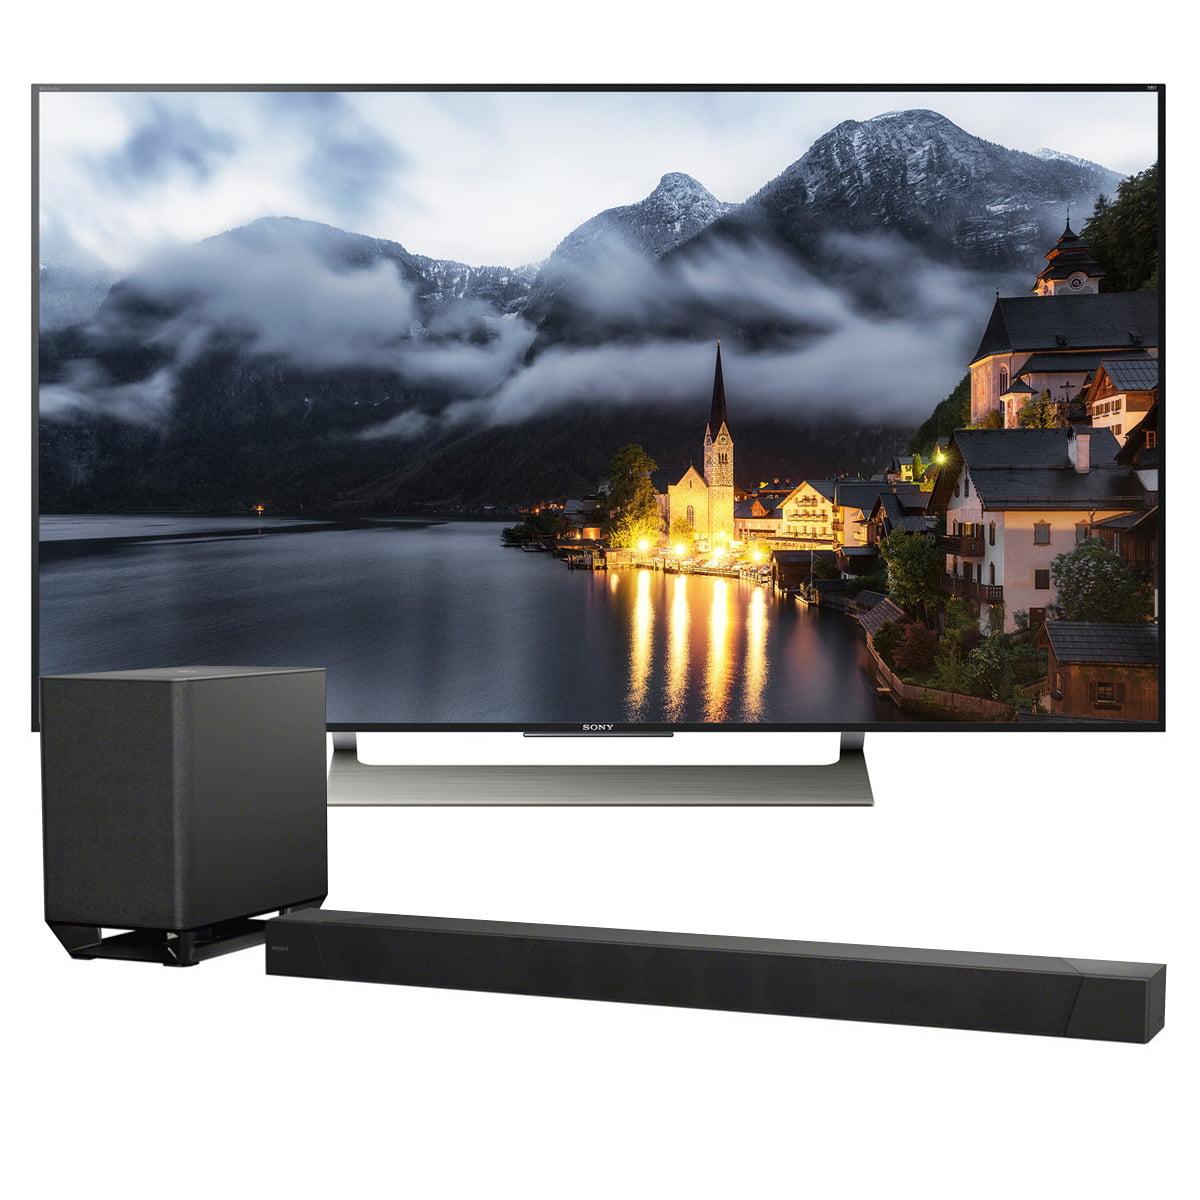 "Sony XBR-55X900E 55"" 4K Ultra HD LED Smart TV with Wi-Fi ..."